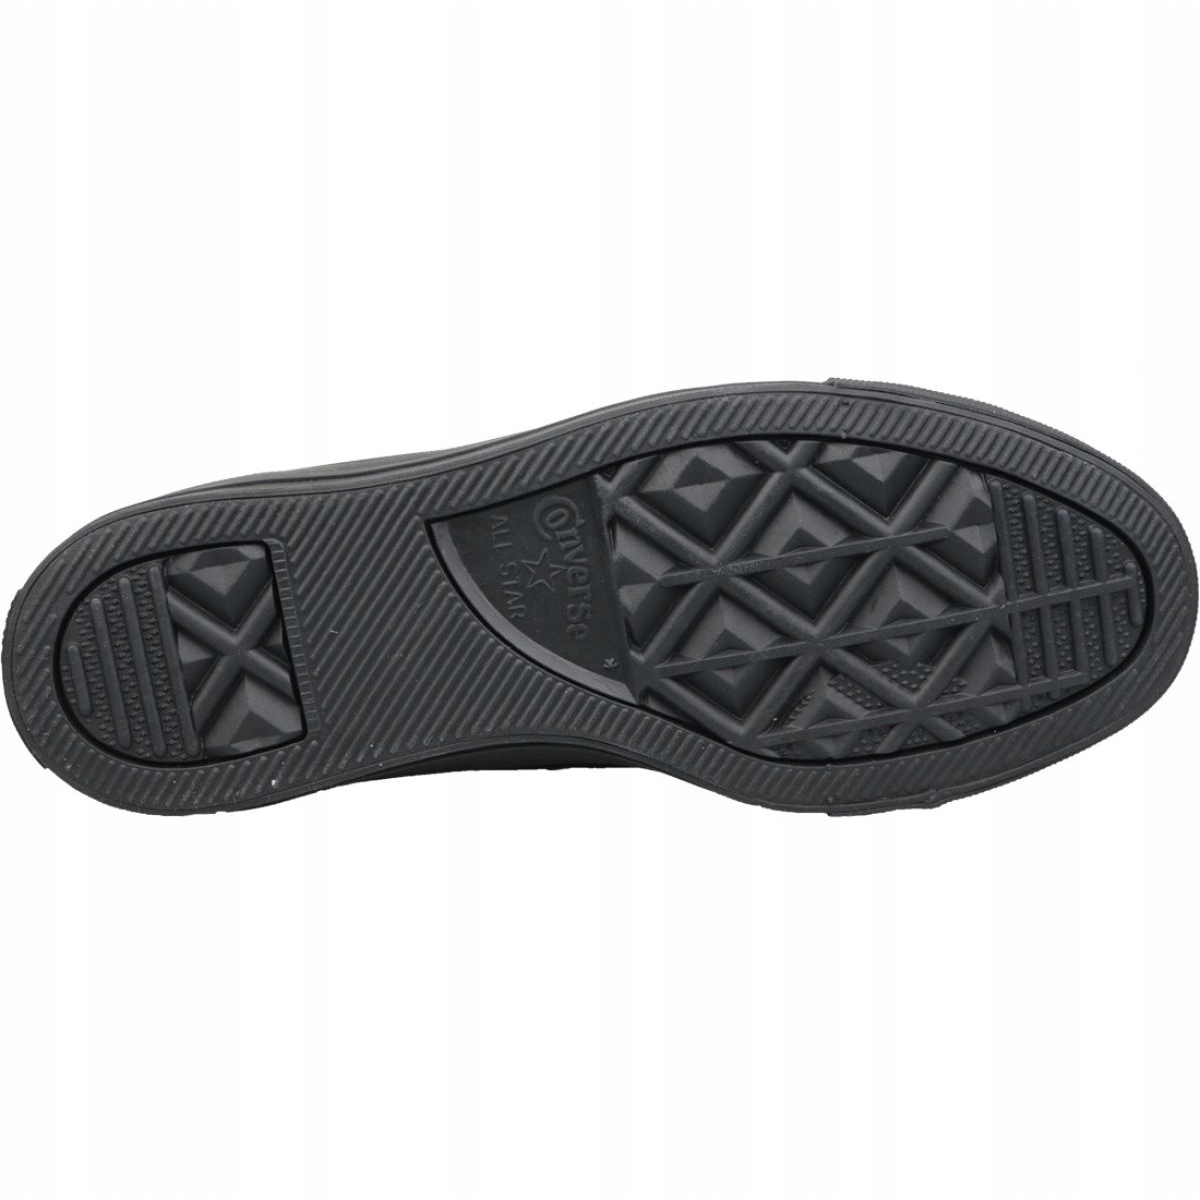 Cipő Converse Chuck Taylor All Star M3310C fekete